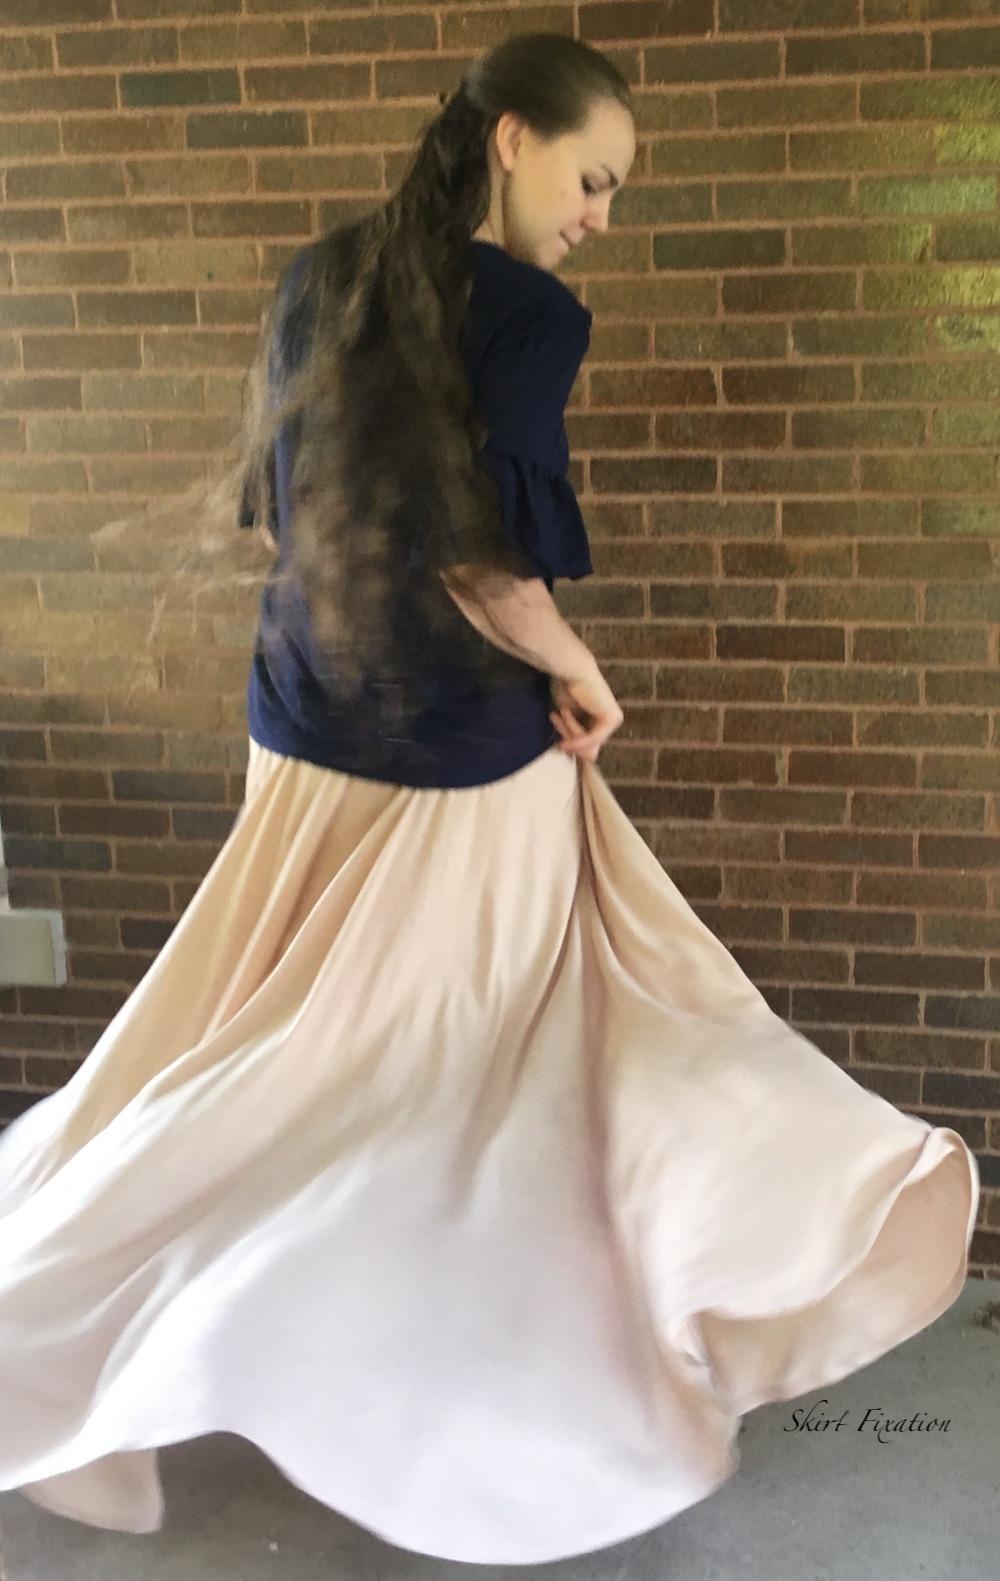 Maxi circle skirt tutorial from Skirt Fixation